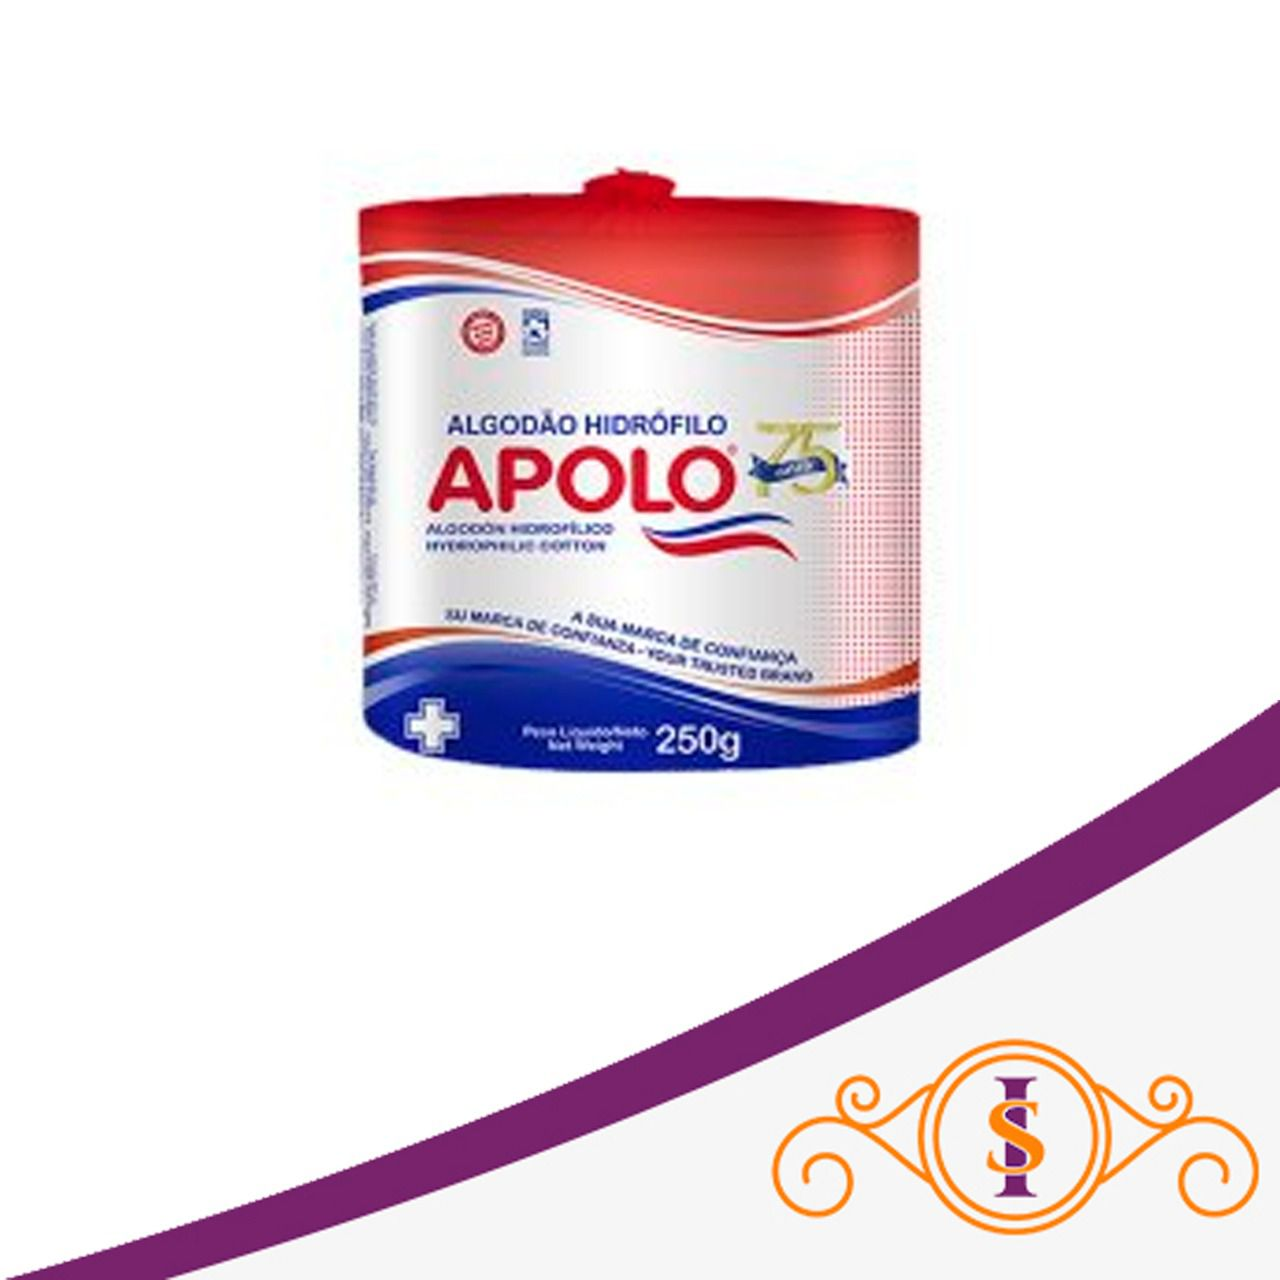 Algodão Hidrófilo Apolo - 250g